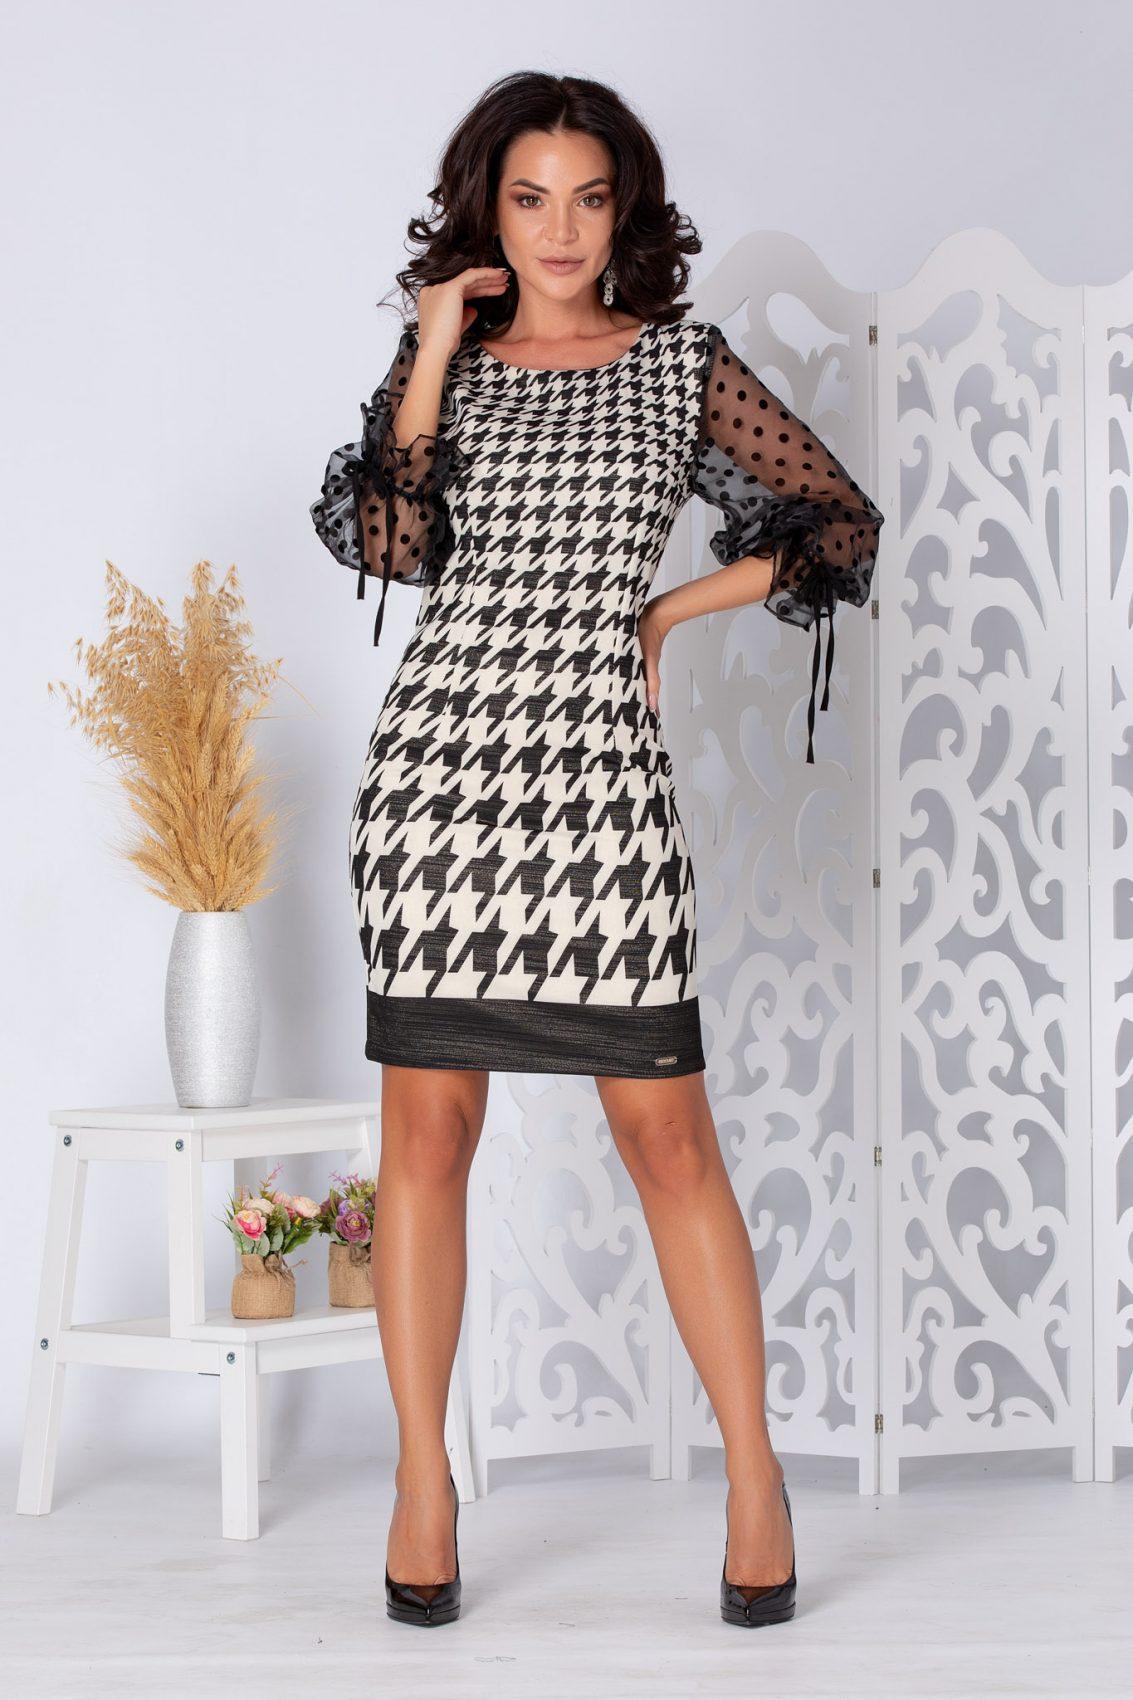 Jenny Ασπρόμαυρο Φόρεμα 5261